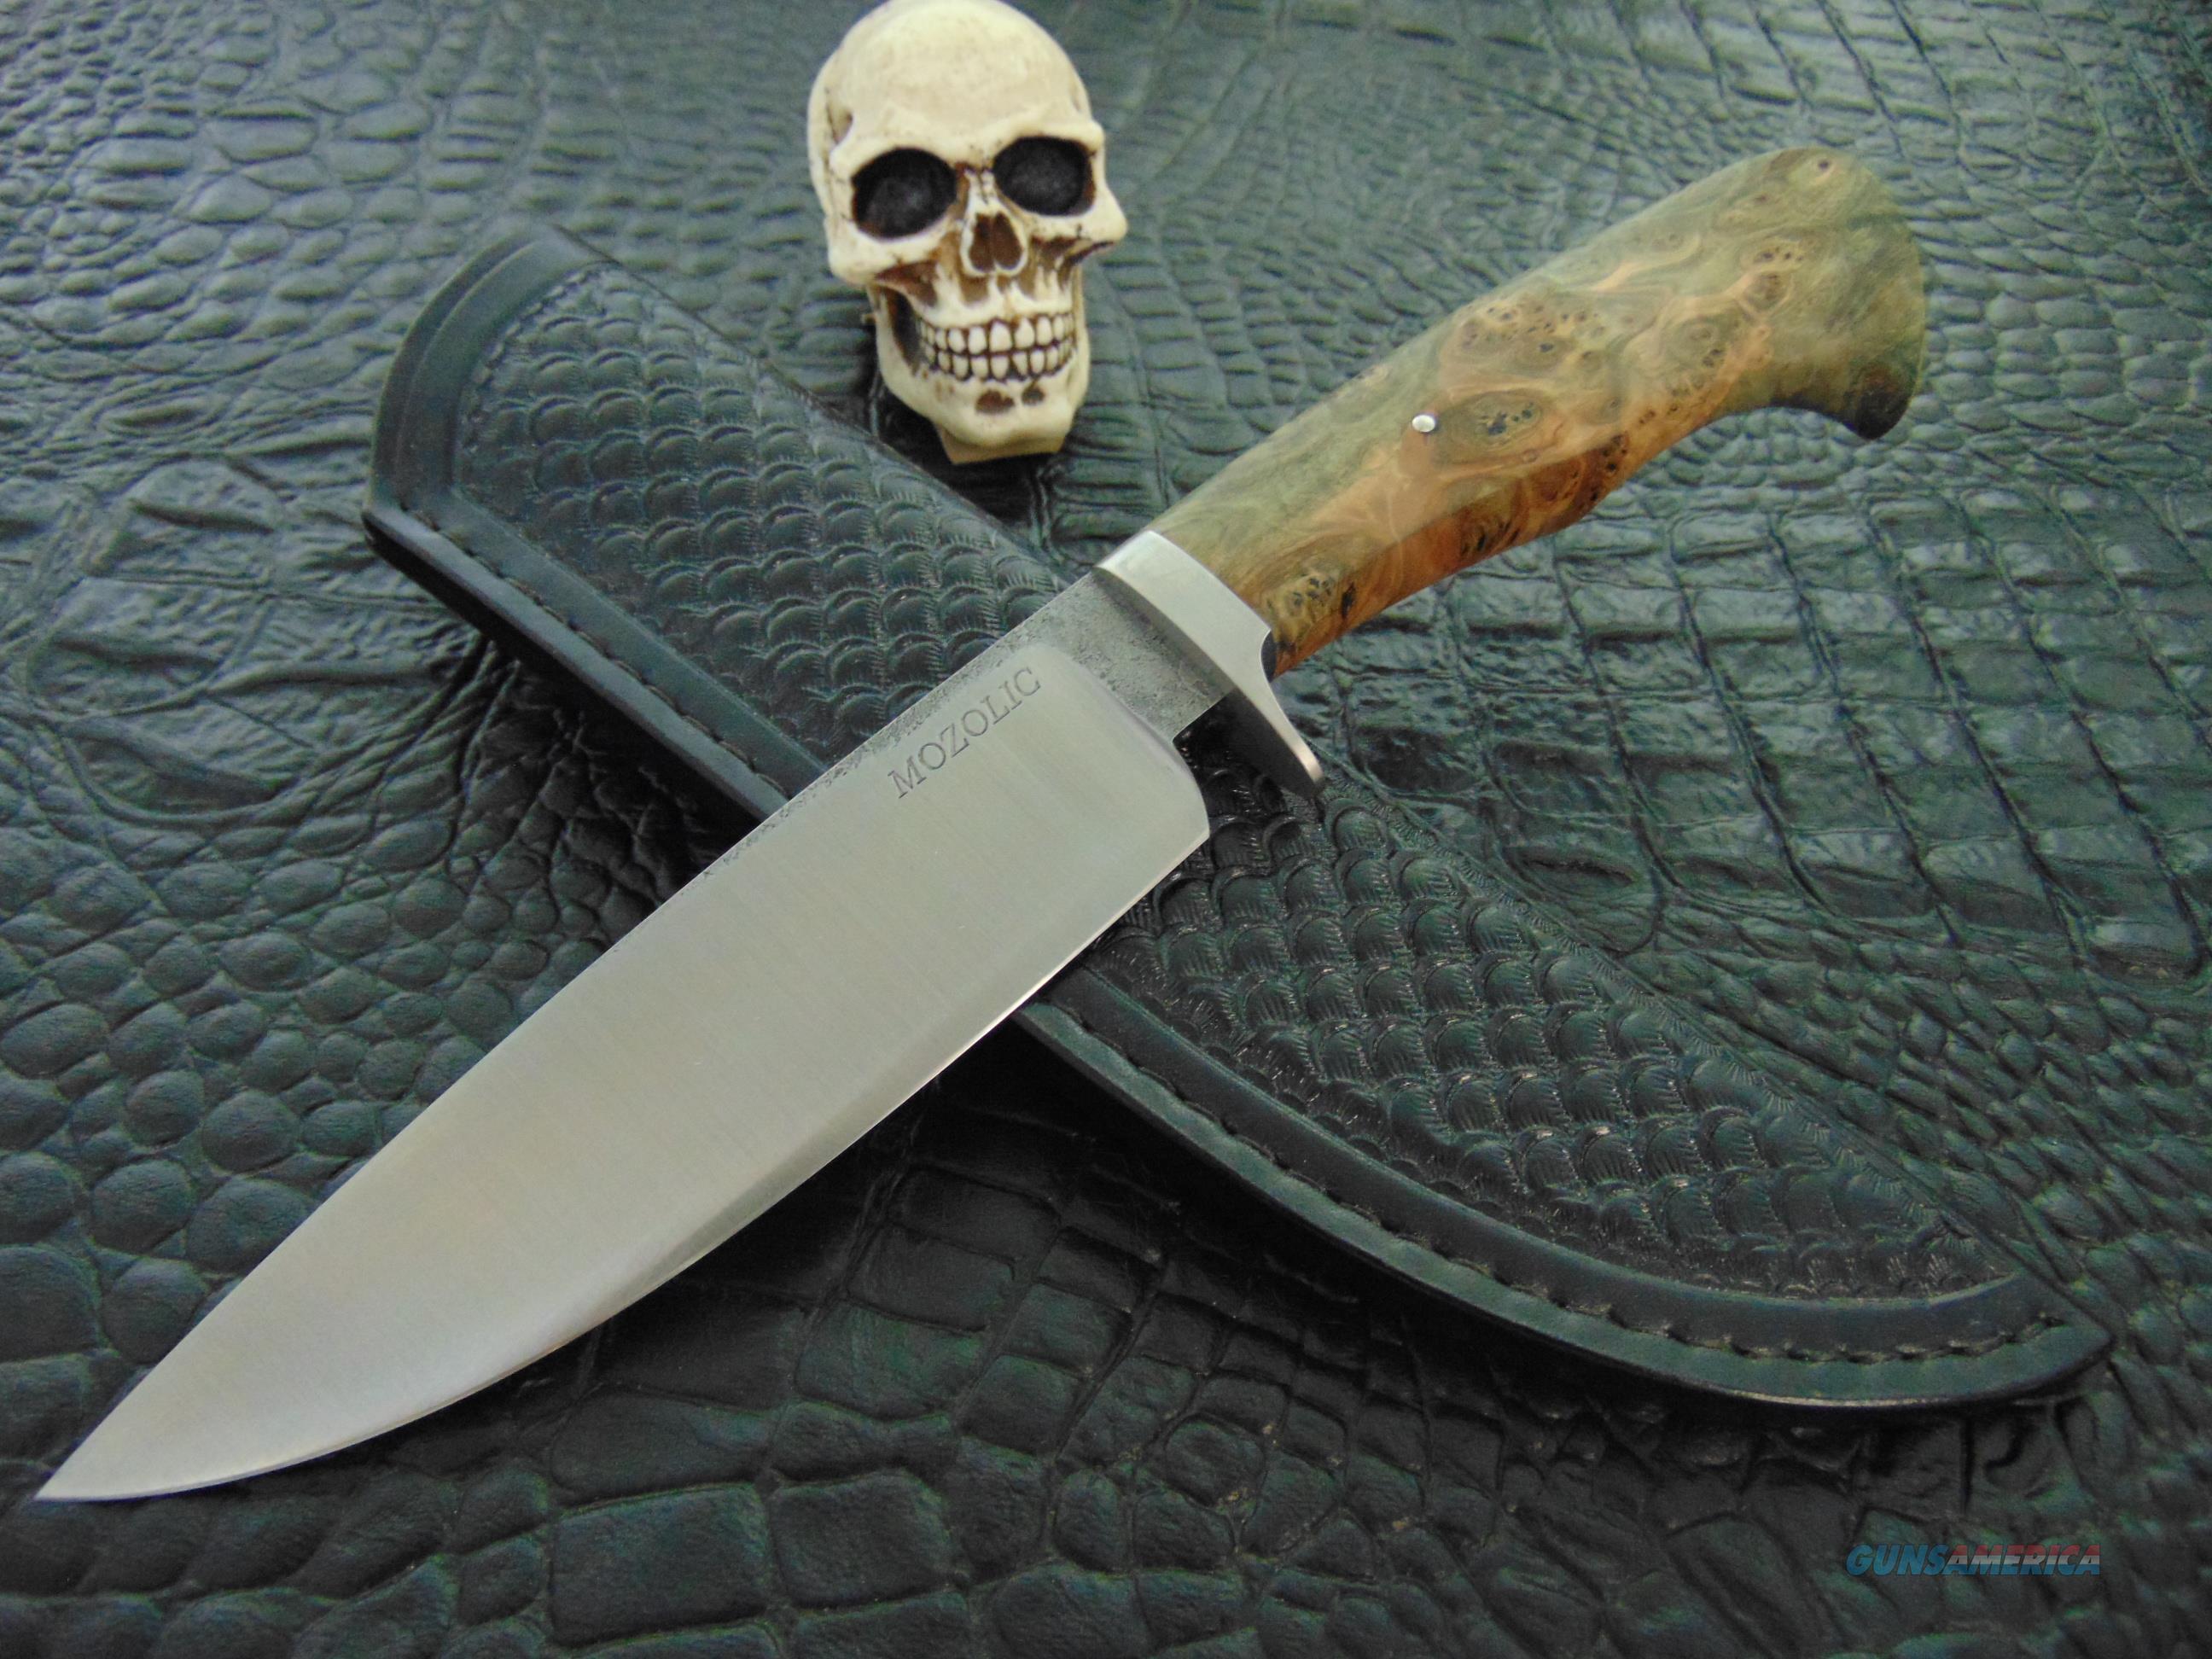 Milan Mozolic Custom Handmade Hand Forged Fighter, Hunting / EDC Knife  Non-Guns > Knives/Swords > Knives > Fixed Blade > Hand Made